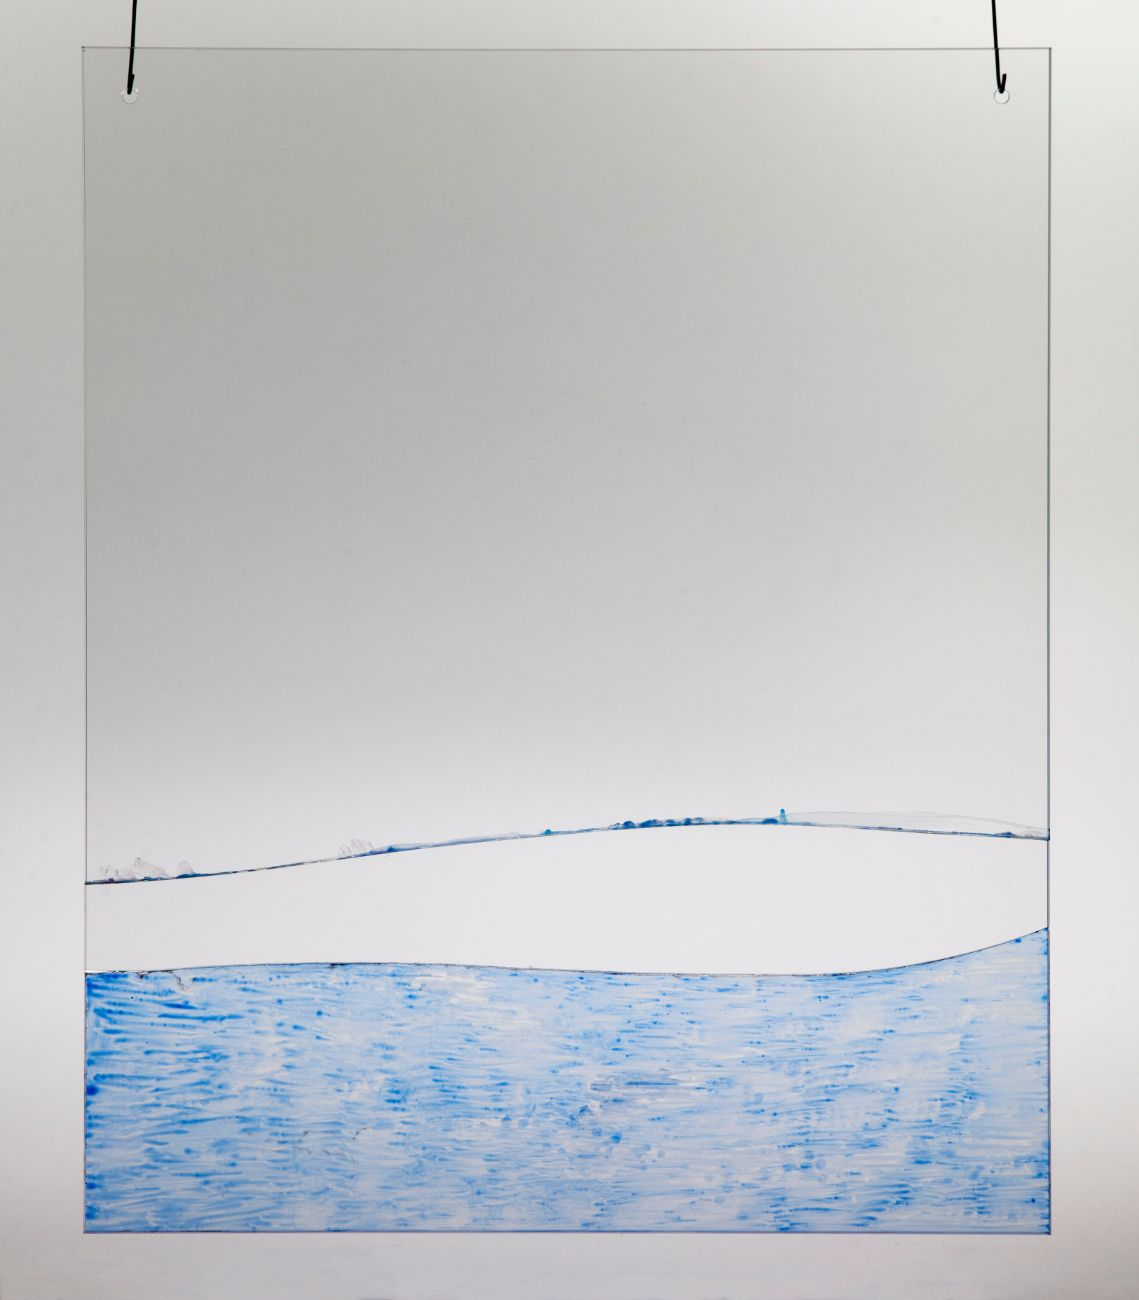 3, 40x50cm, maľba na skle, 2018